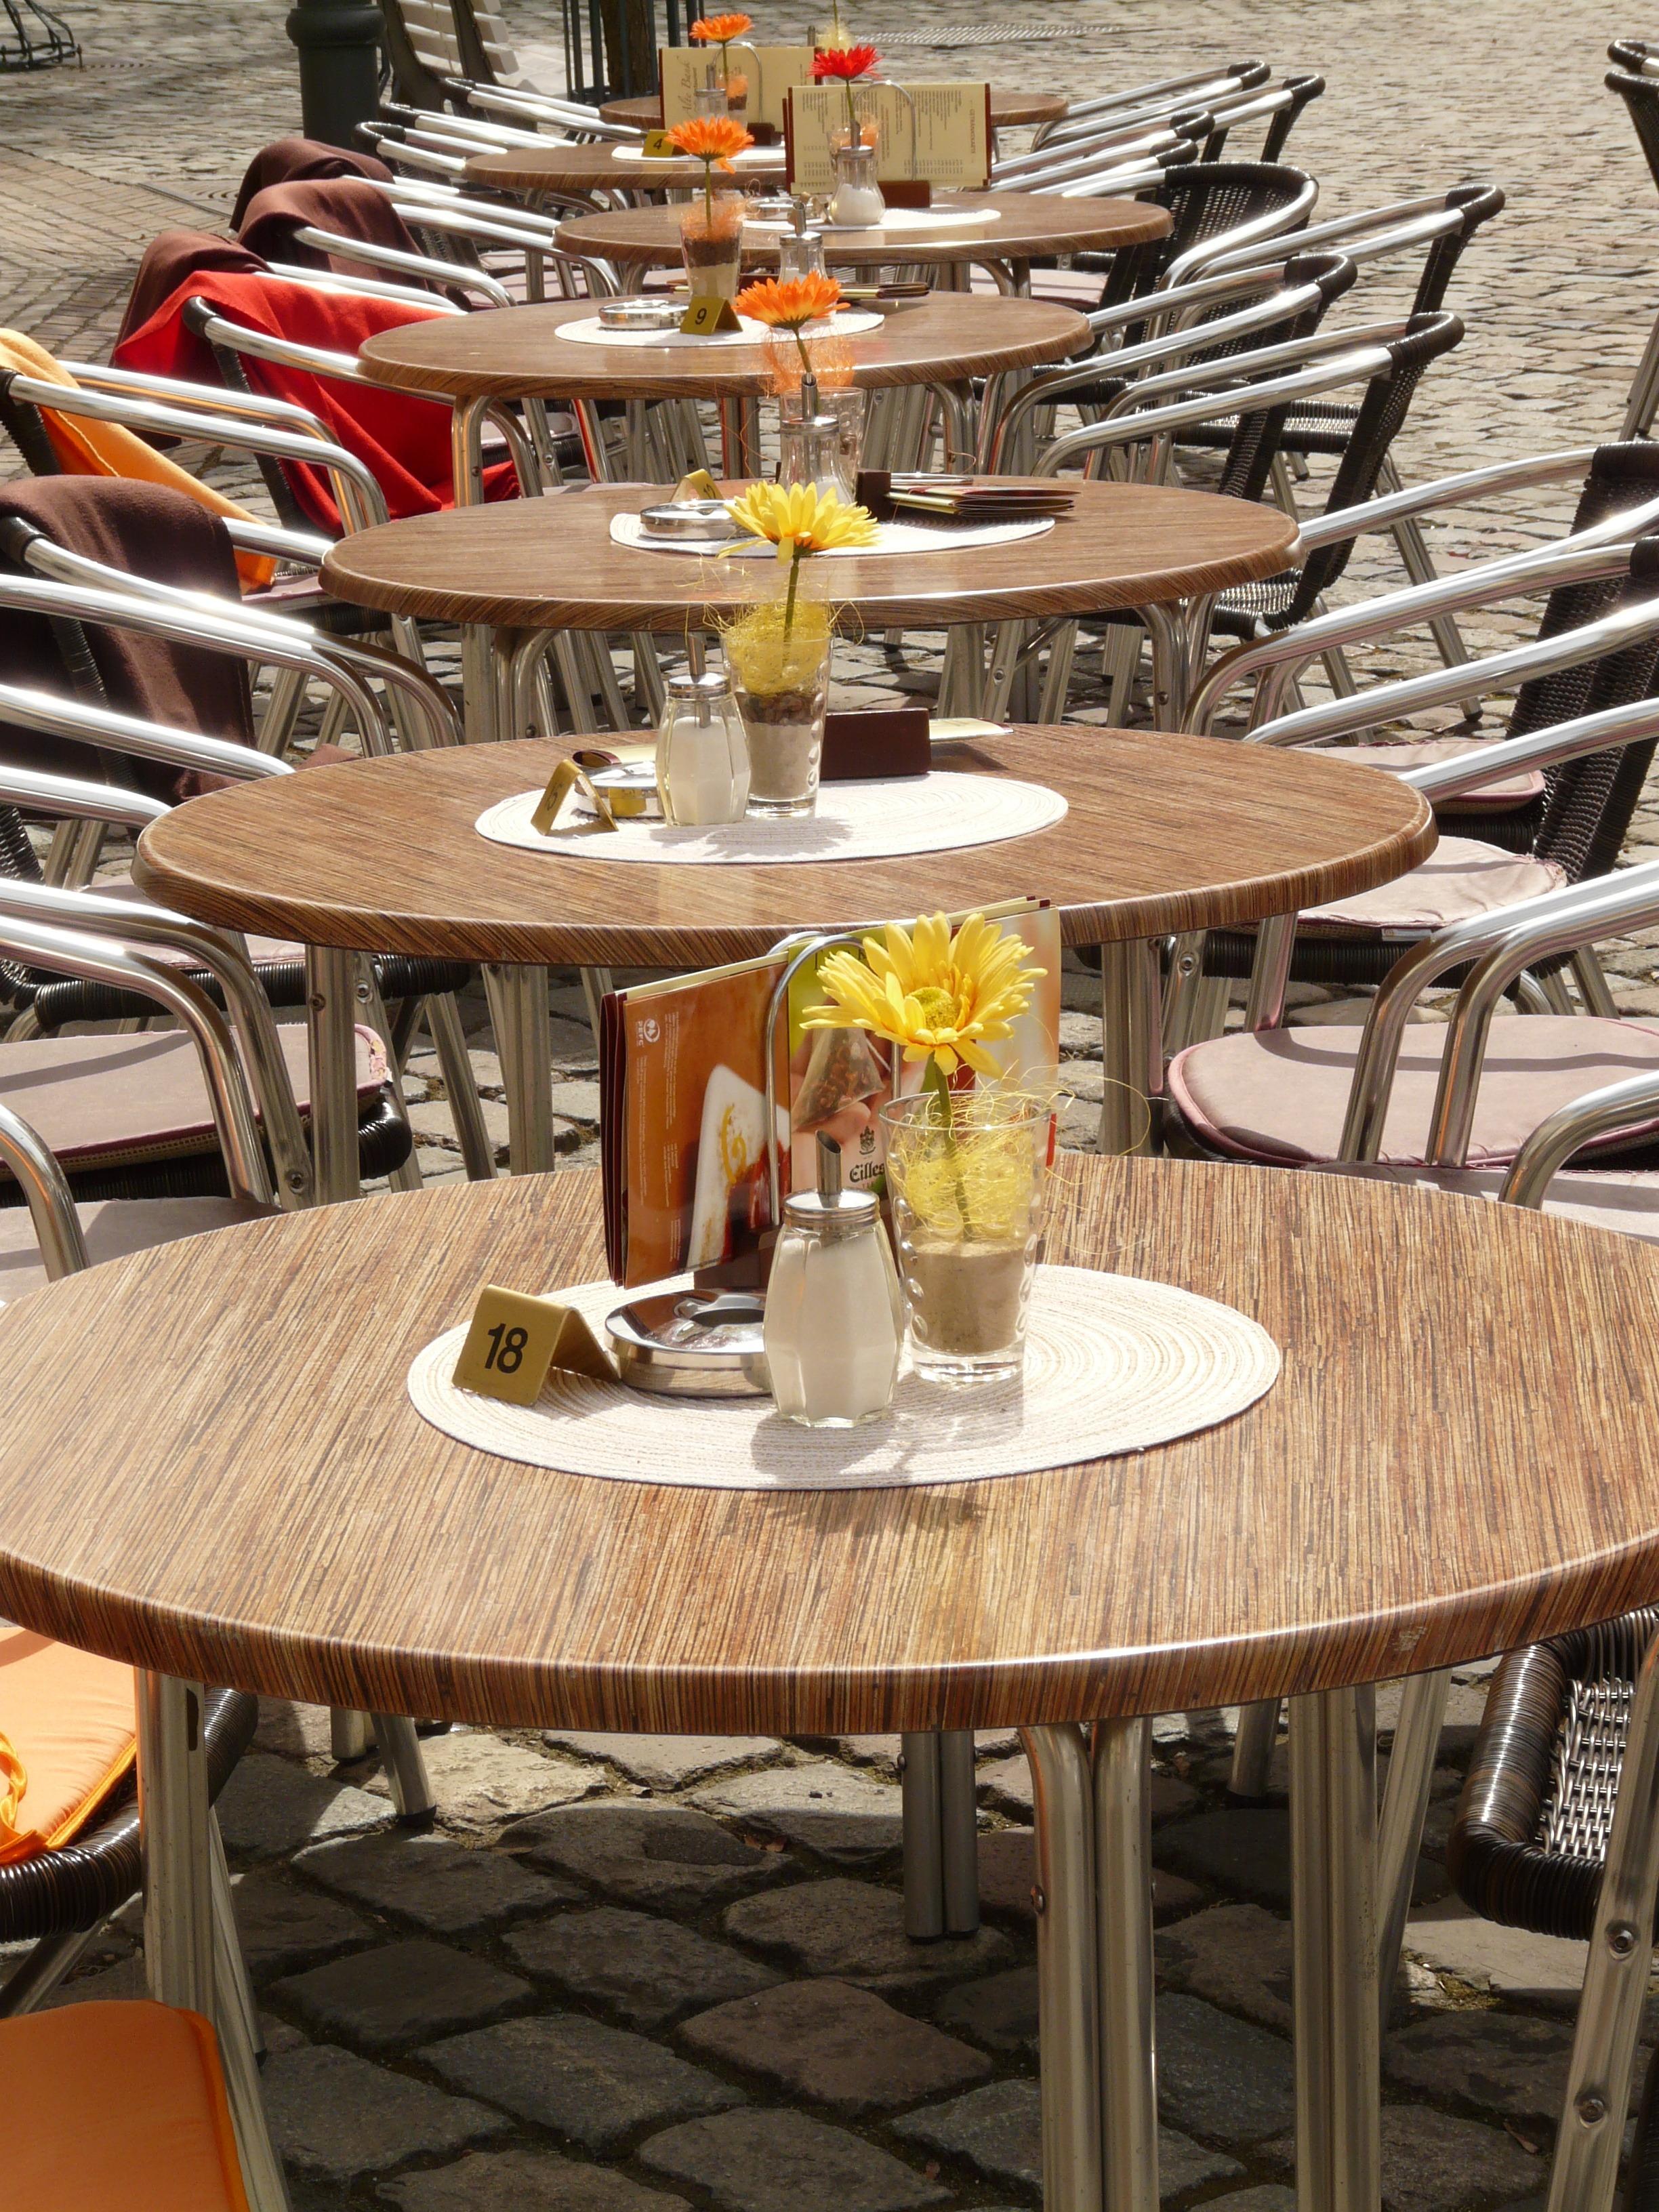 Kostenlose foto : Tabelle, Cafe, Kaffee, Holz, Straße, Blume ...